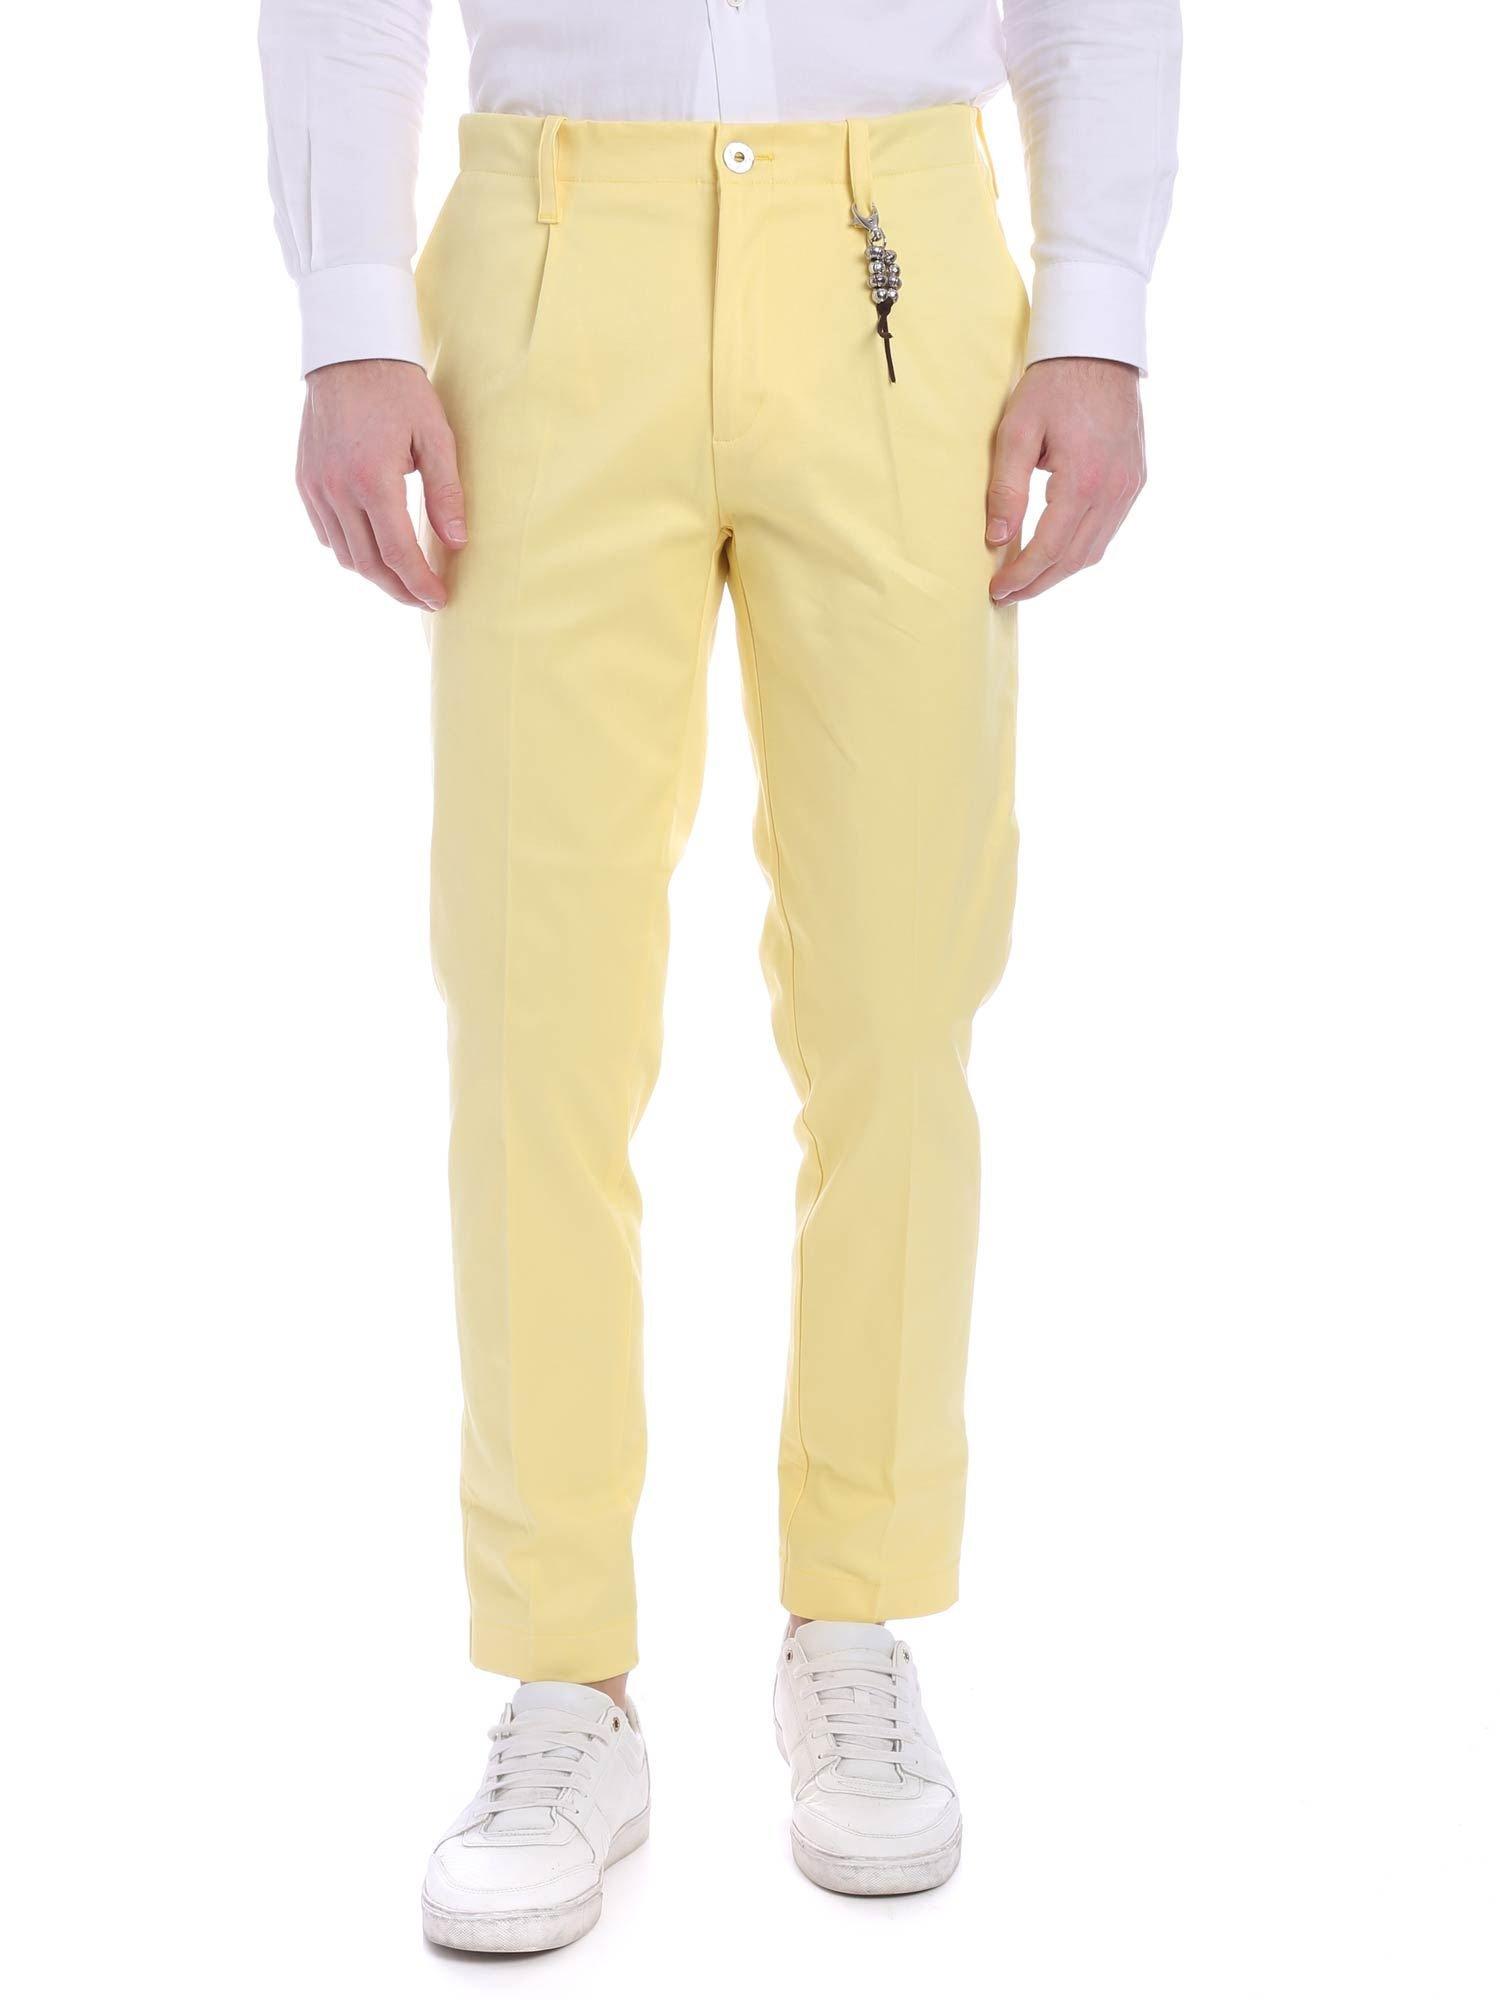 Image of Pantalone una pence lino giallo R92 L-G